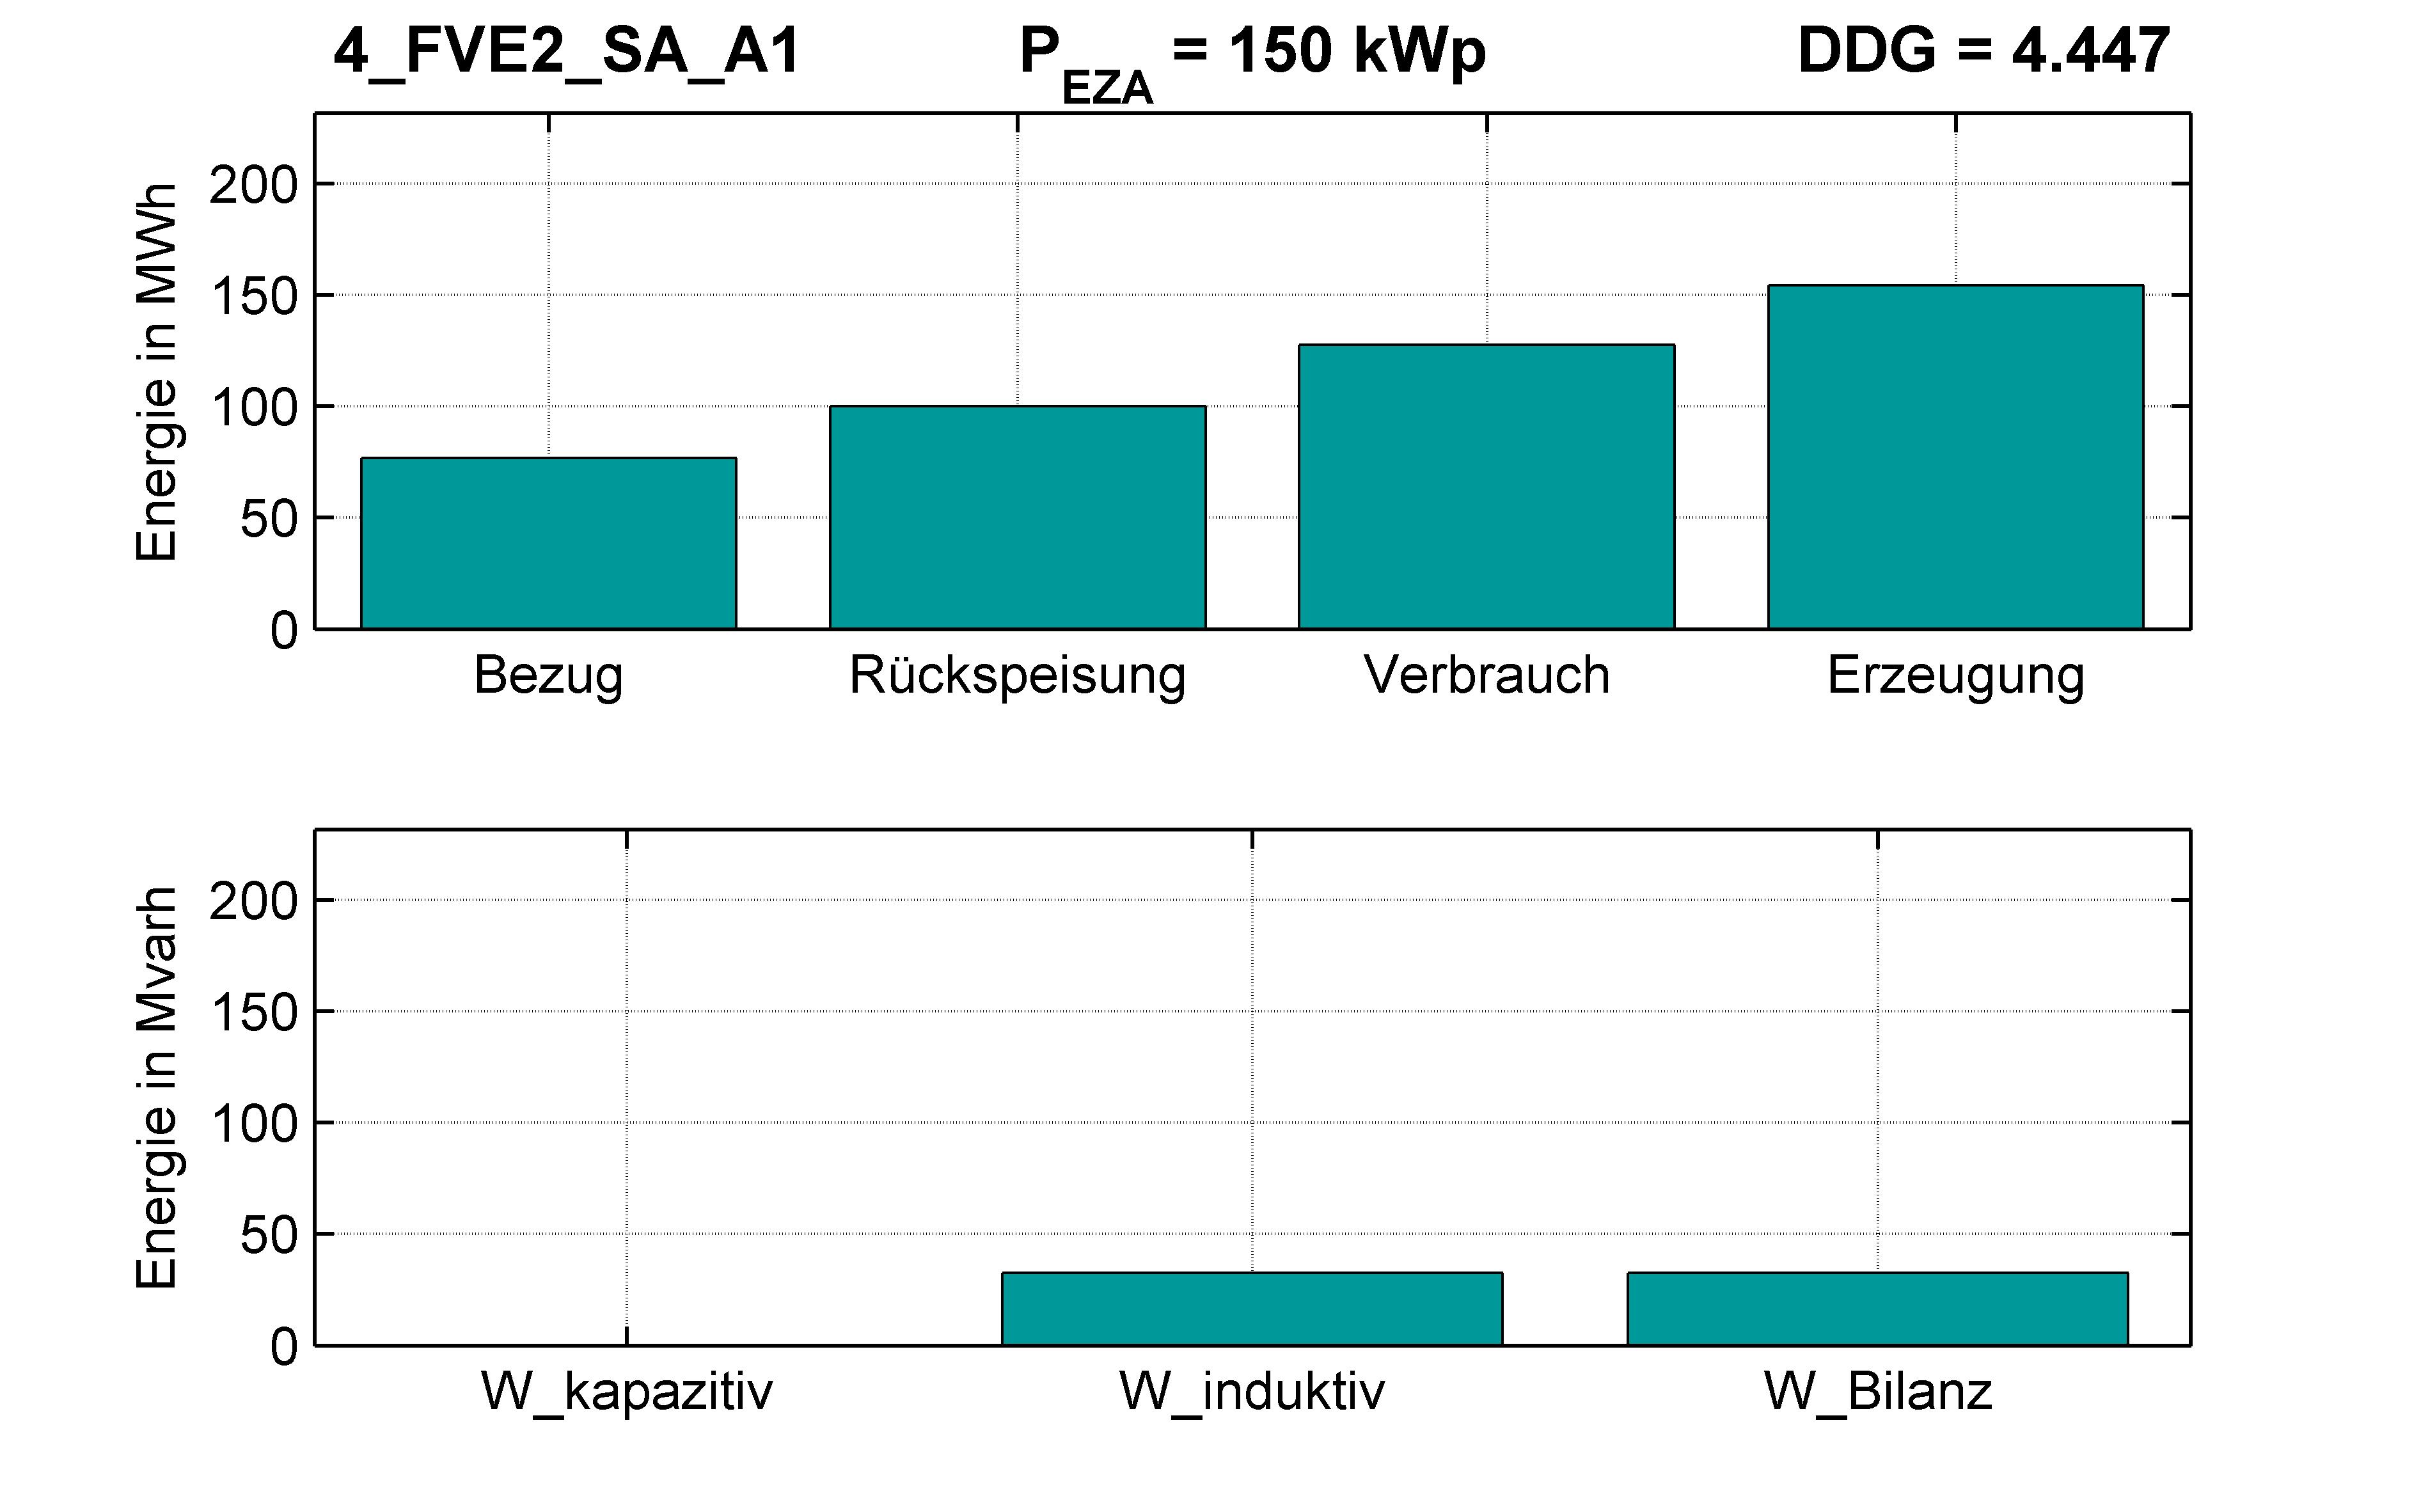 FVE2 | P-Kappung 55% (SA) A1 | PQ-Bilanz